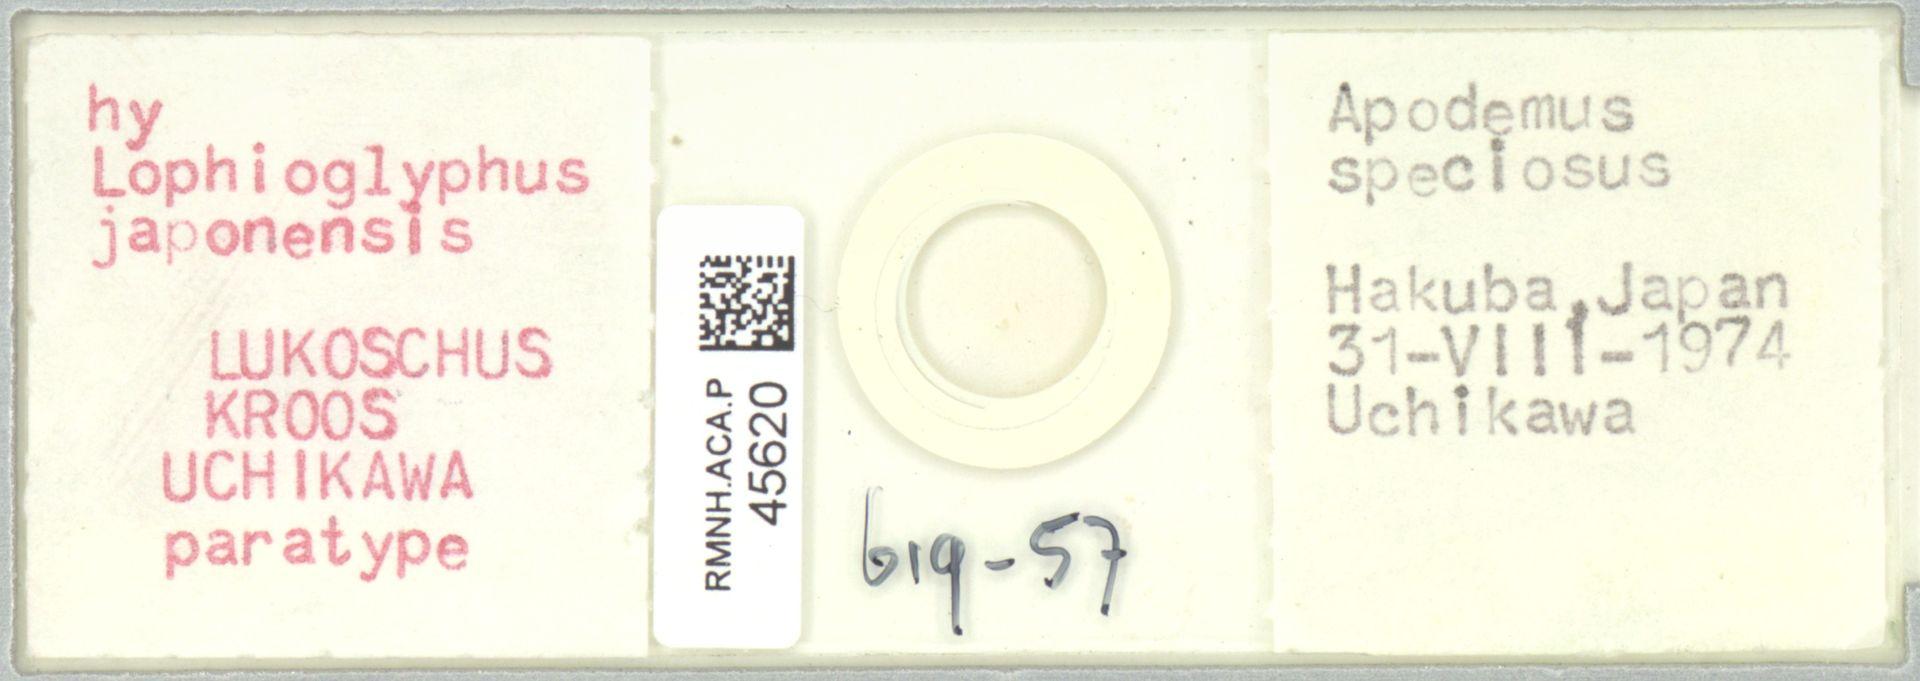 RMNH.ACA.P.45620 | Lophioglyphus japonensis Lukoschus, Kroos, Uchikawa